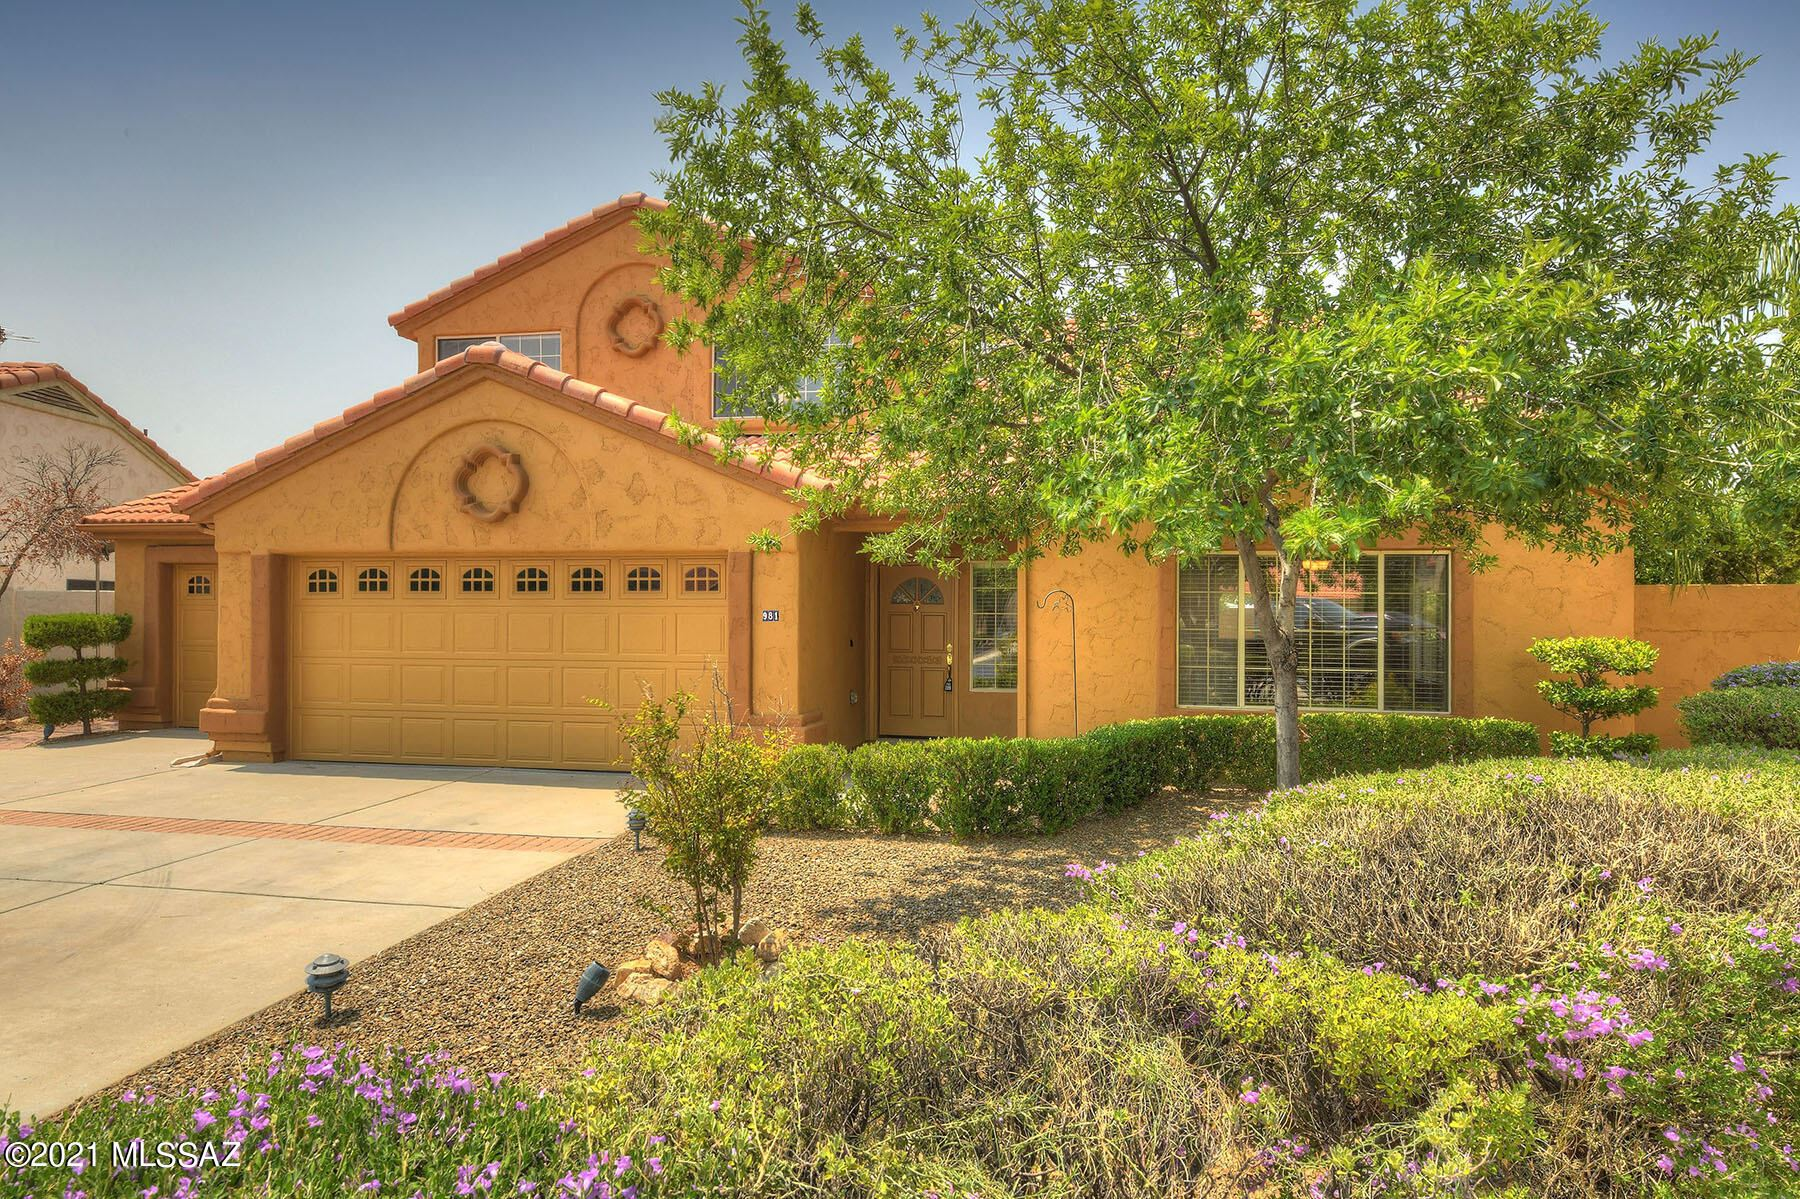 981 W Graythorn Place, Tucson, AZ 85737 - MLS#: 22118210